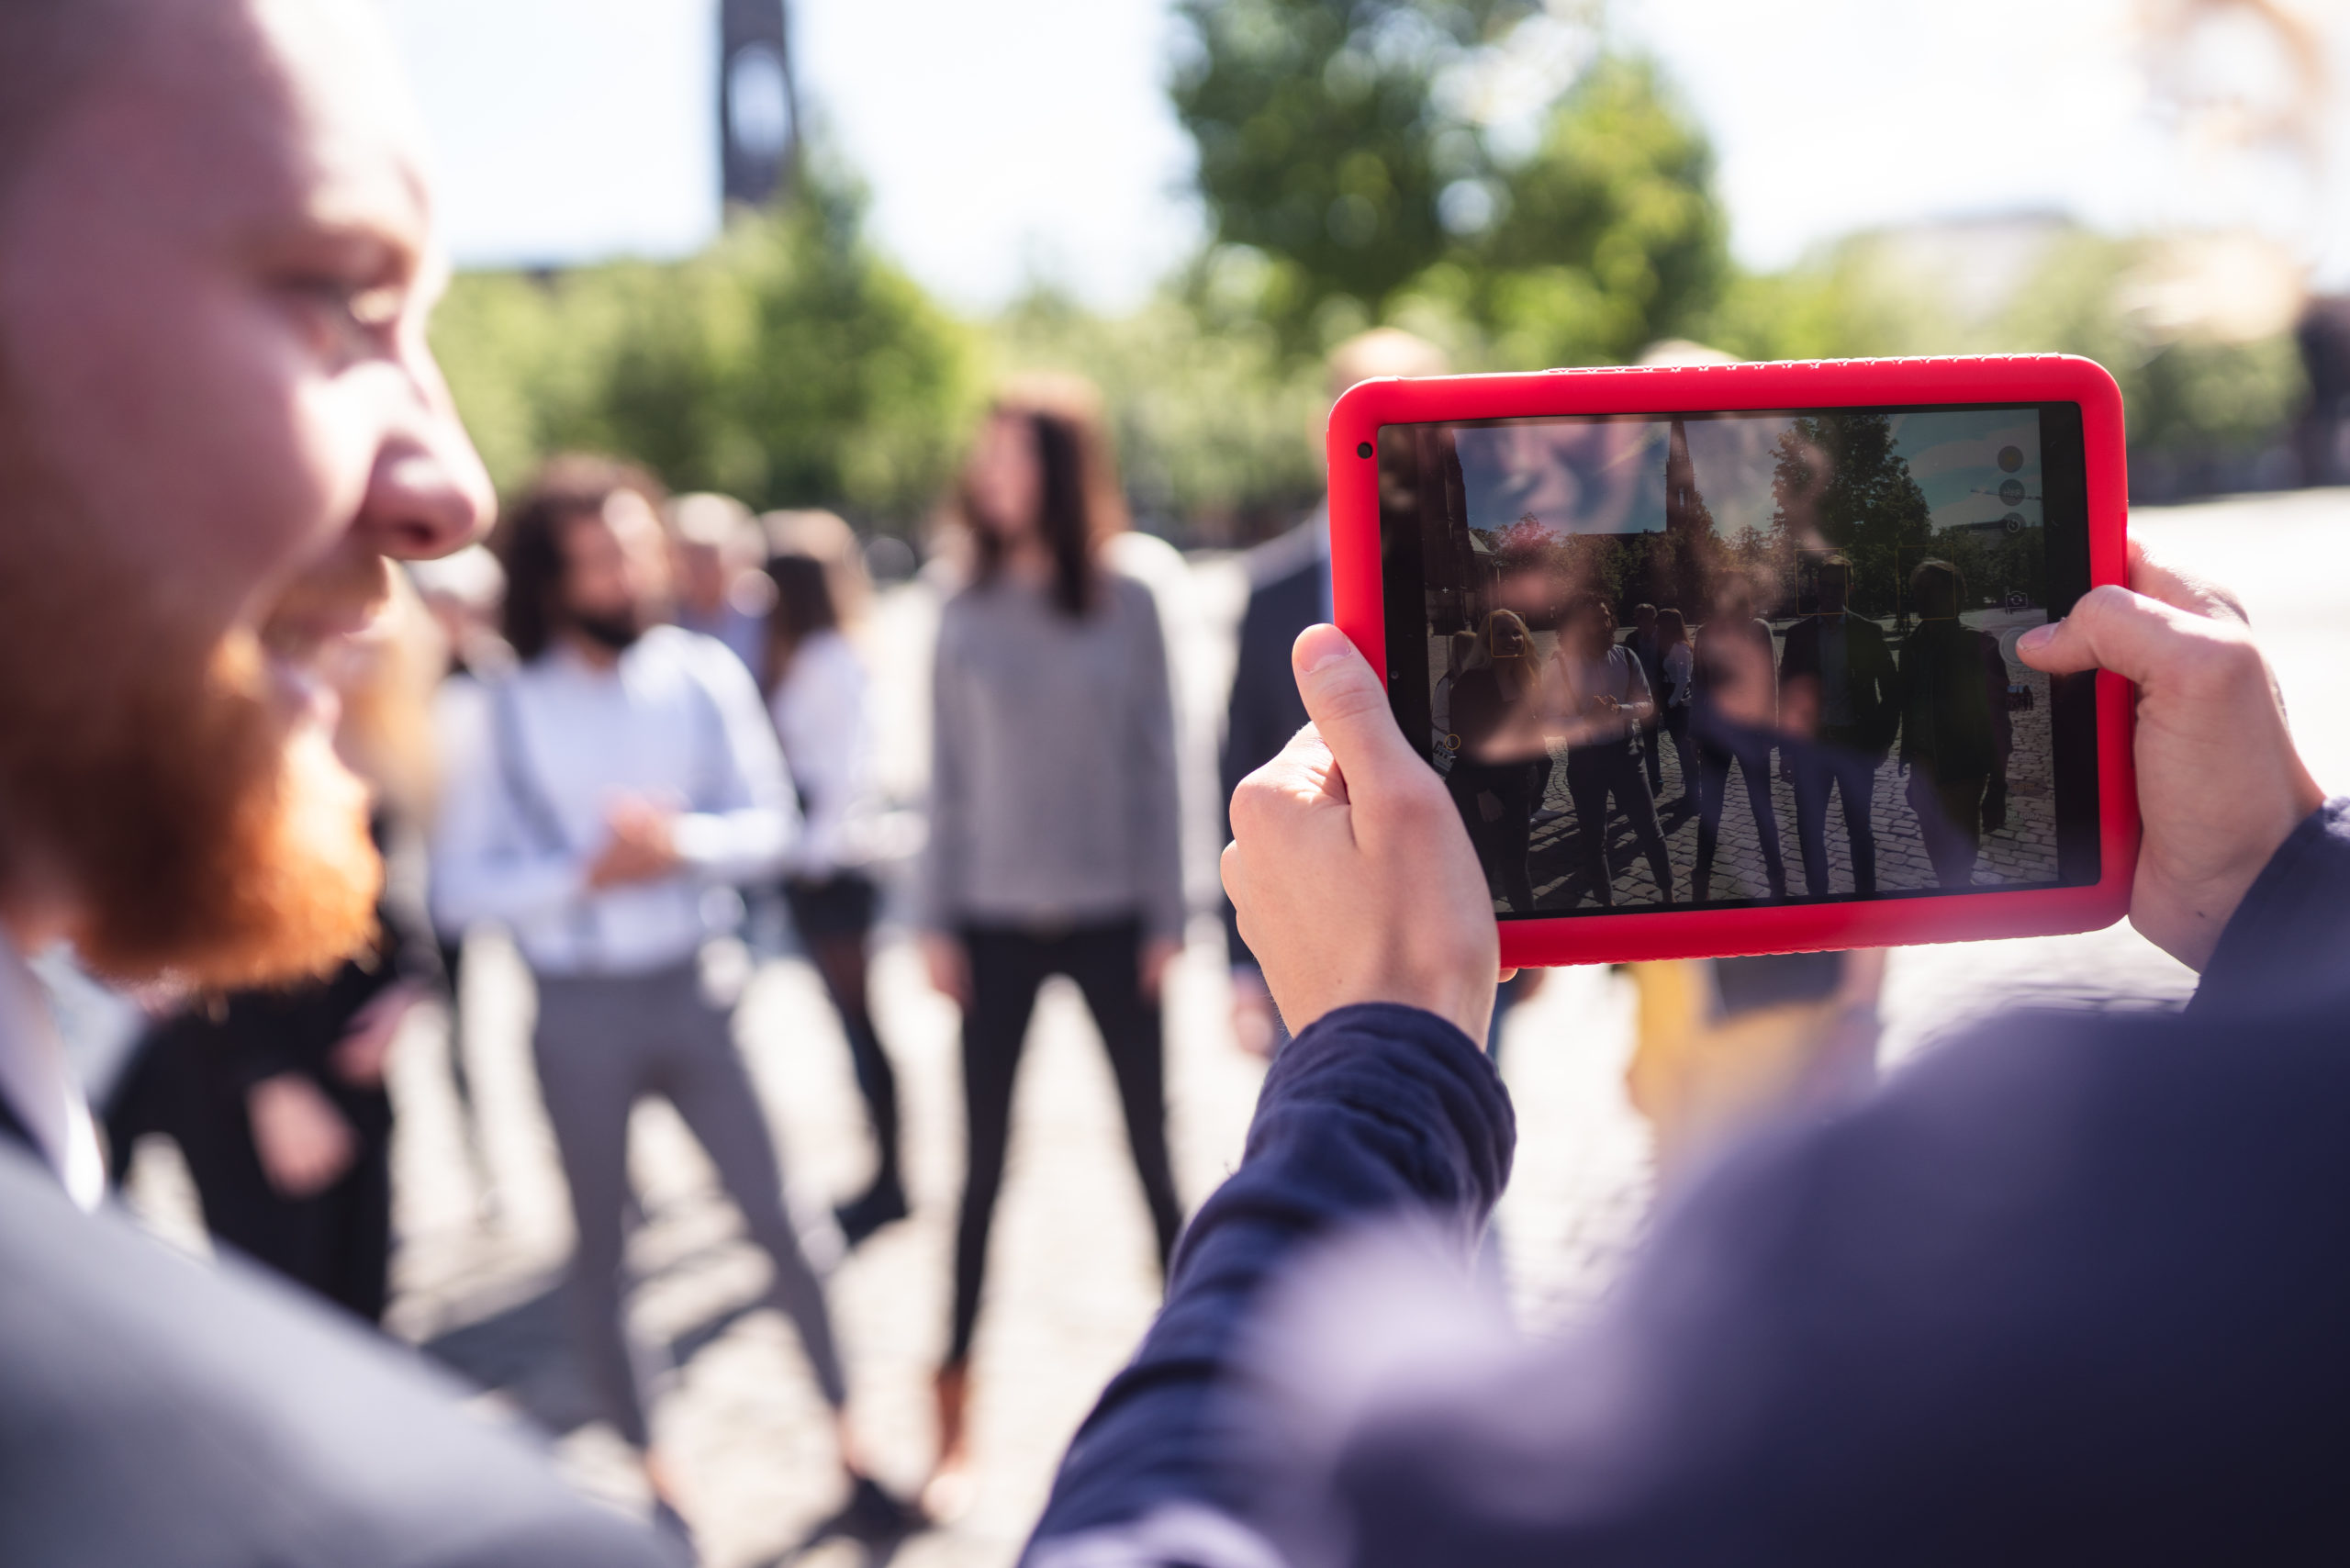 CityGames München Firmen Team Pro Tour: Firmengruppenfoto mit dem iPad